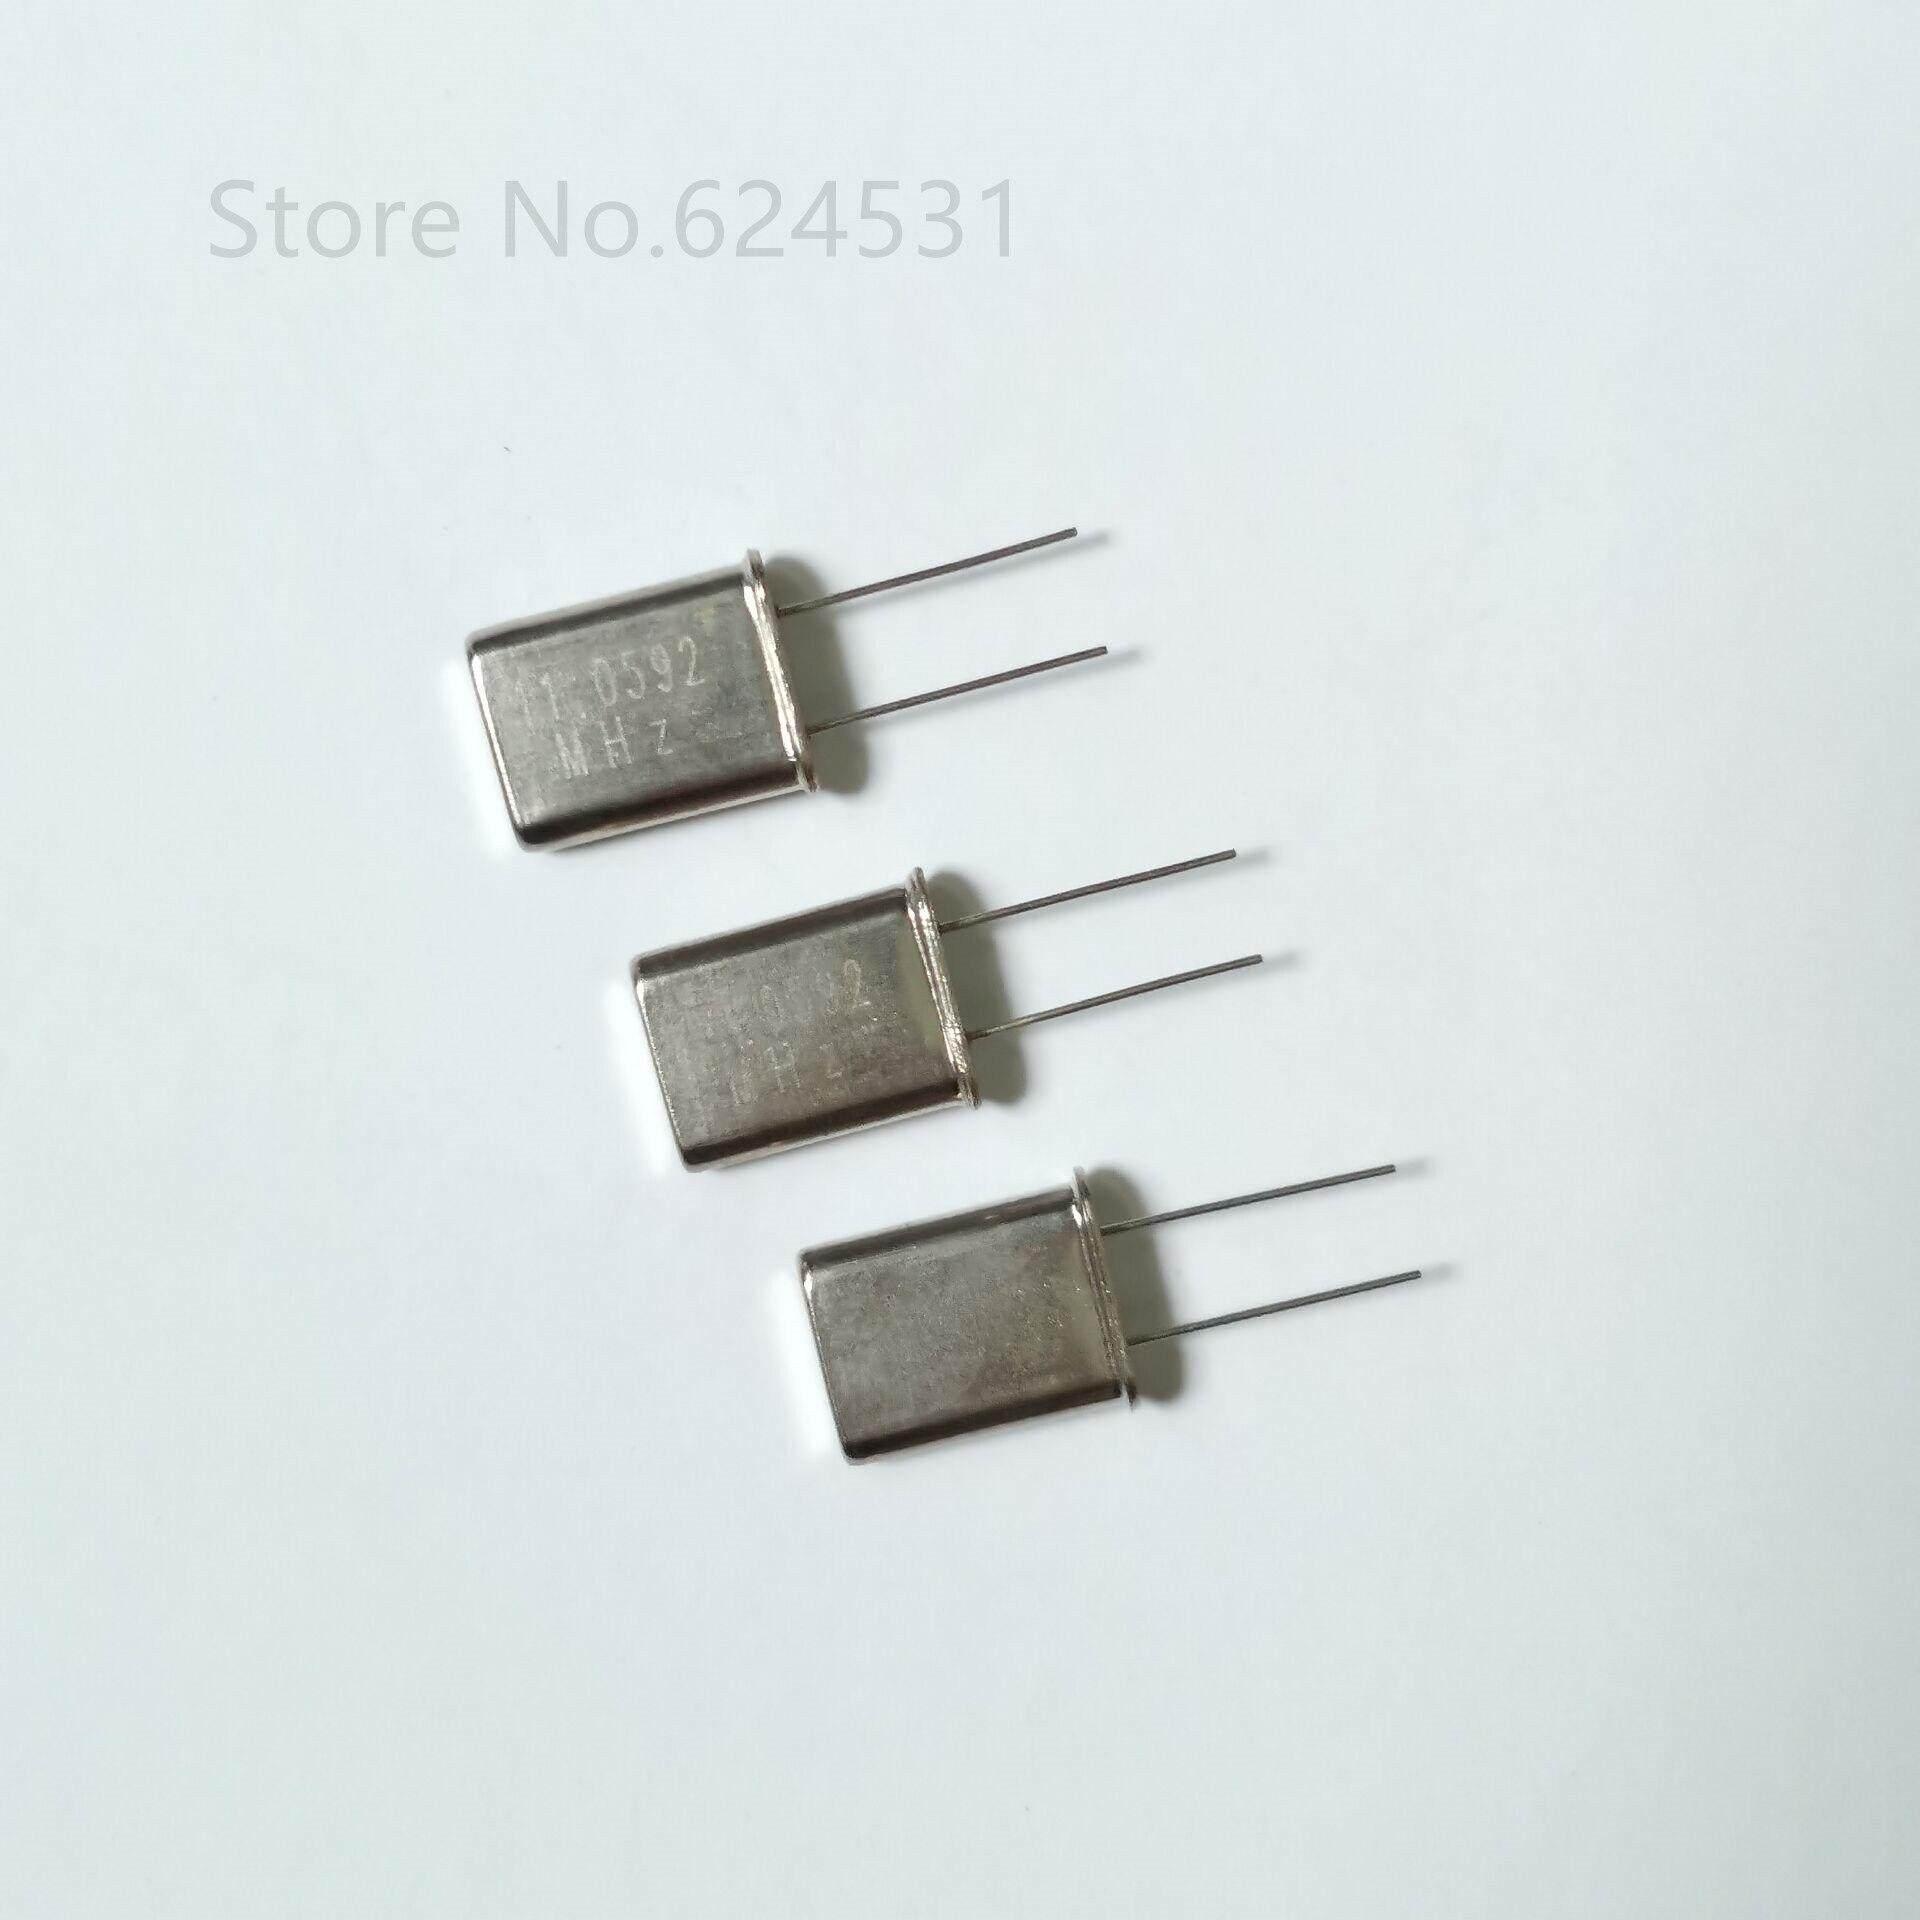 10pcs In-line HC-49U Quartz Crystal 11.0592MHZ 11.0592M Passive Crystal Resonator